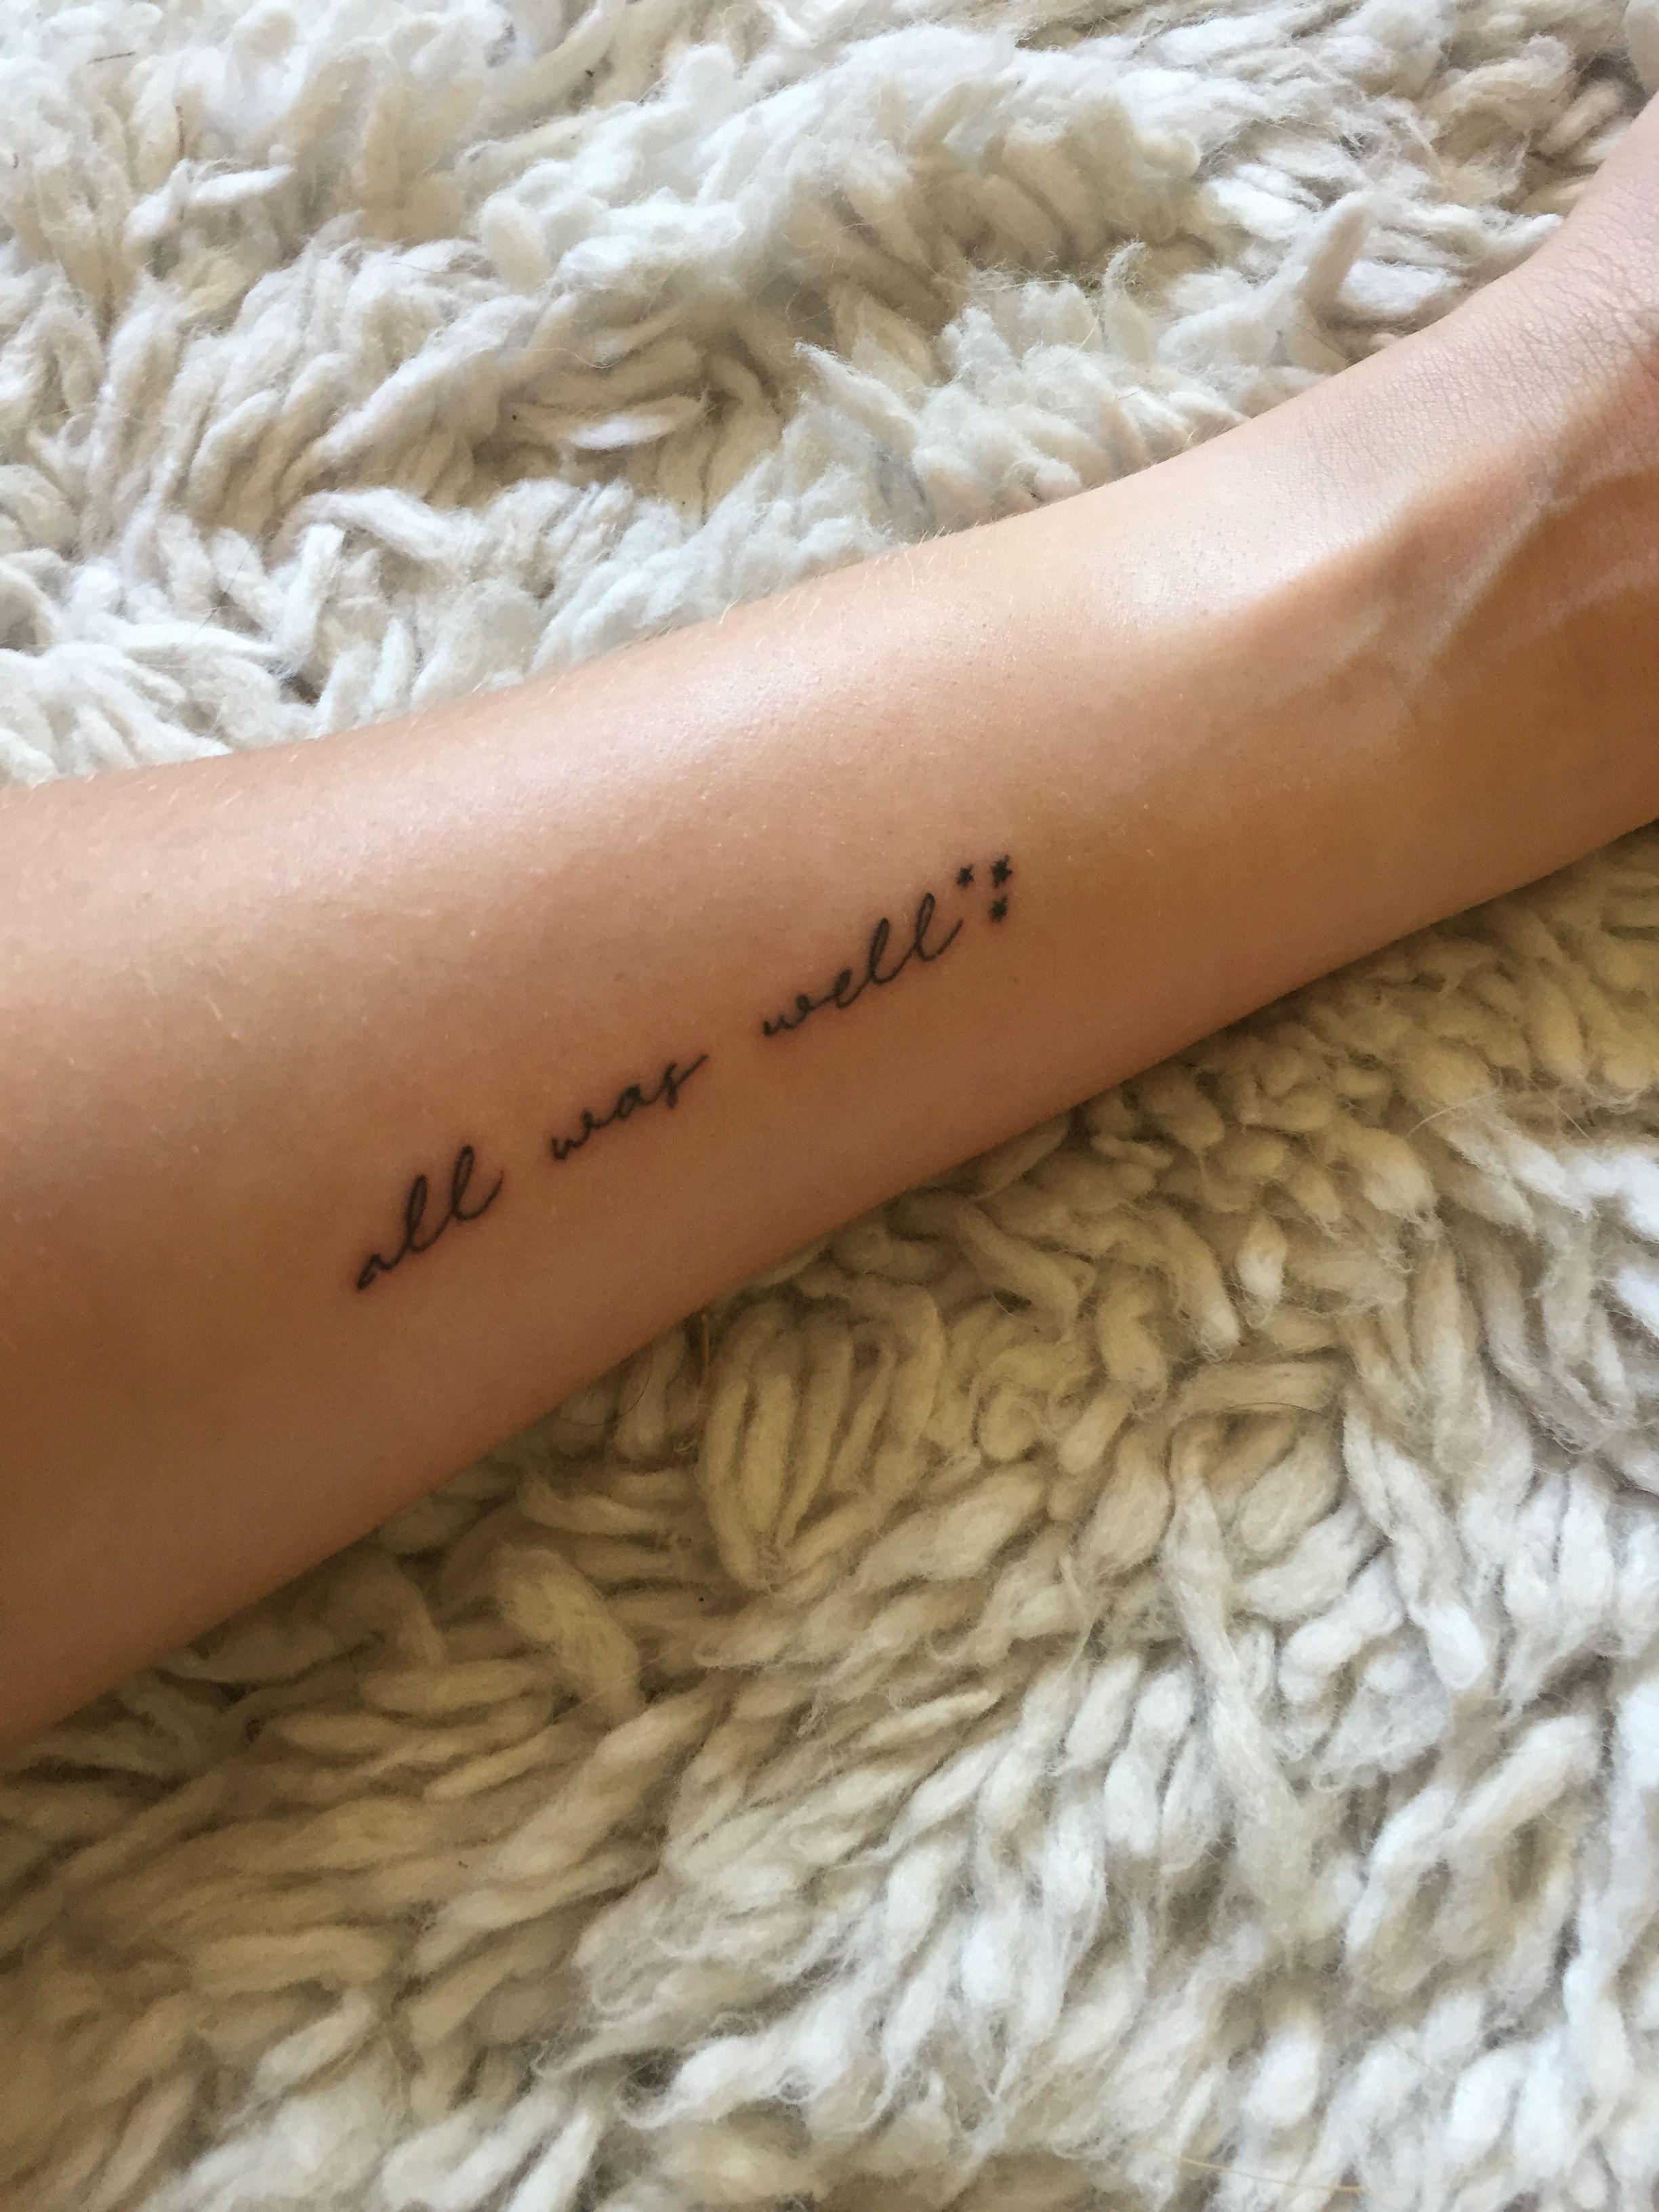 Harry Potter All Was Well Tattoo Harry Potter Tattoo Small Foot Tattoos For Women Harry Potter Quotes Tattoo